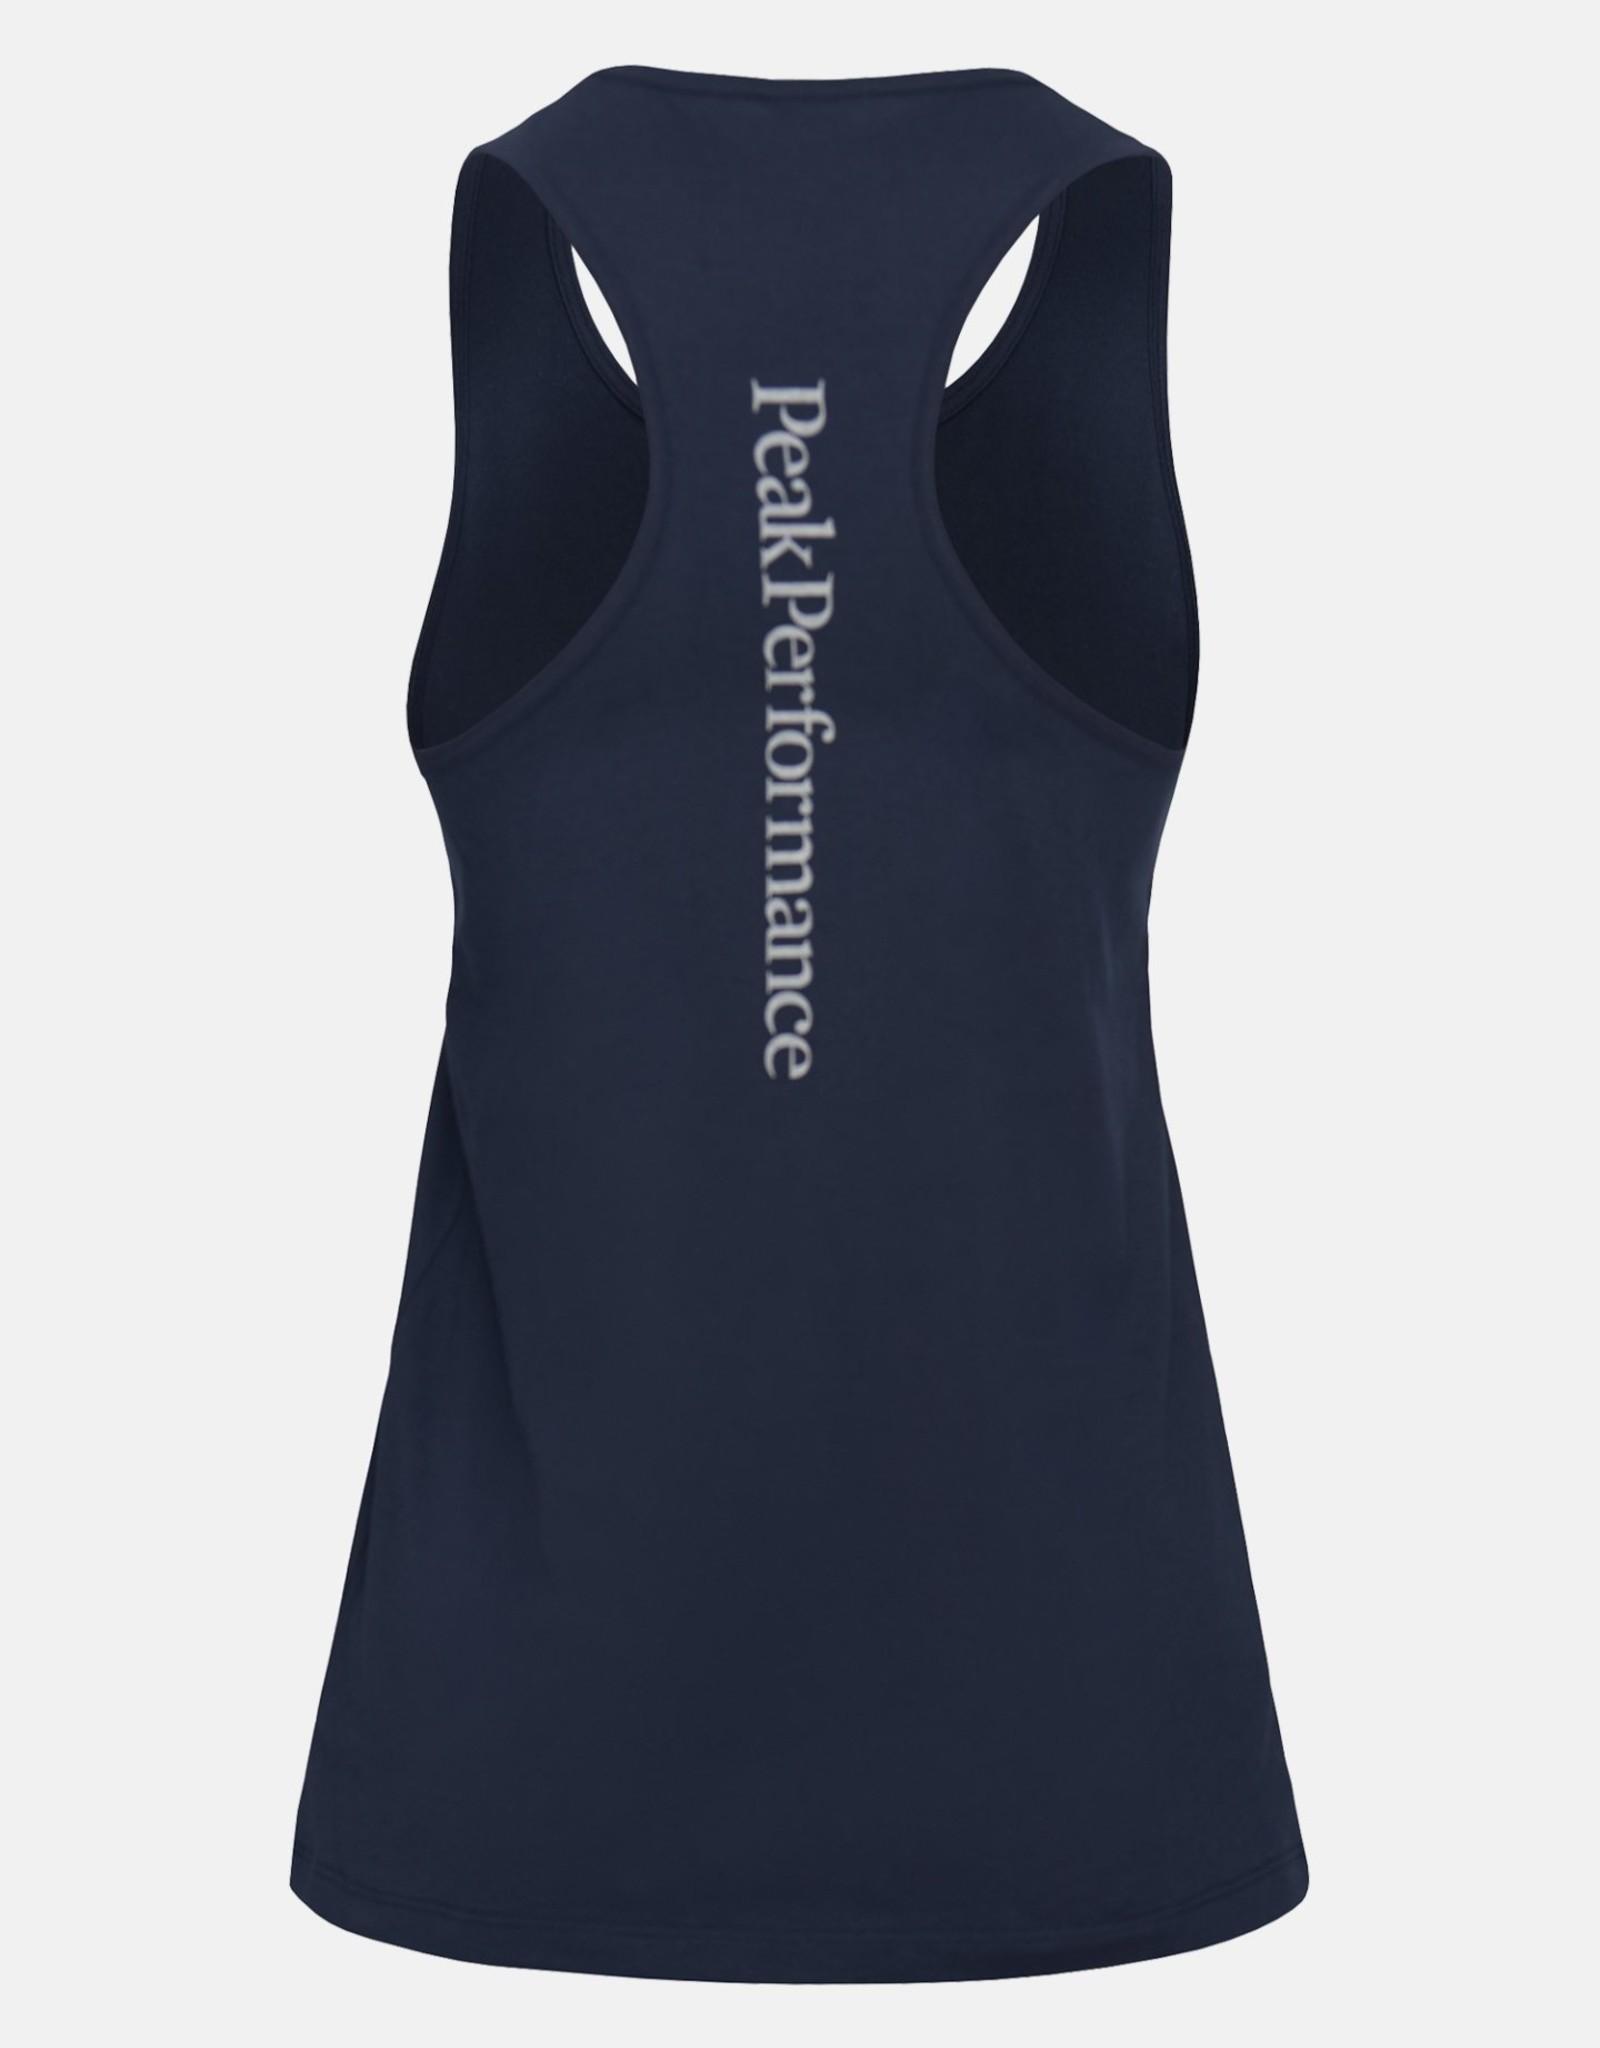 Peak Performance Peak Performance Women's Track Tank - S2020